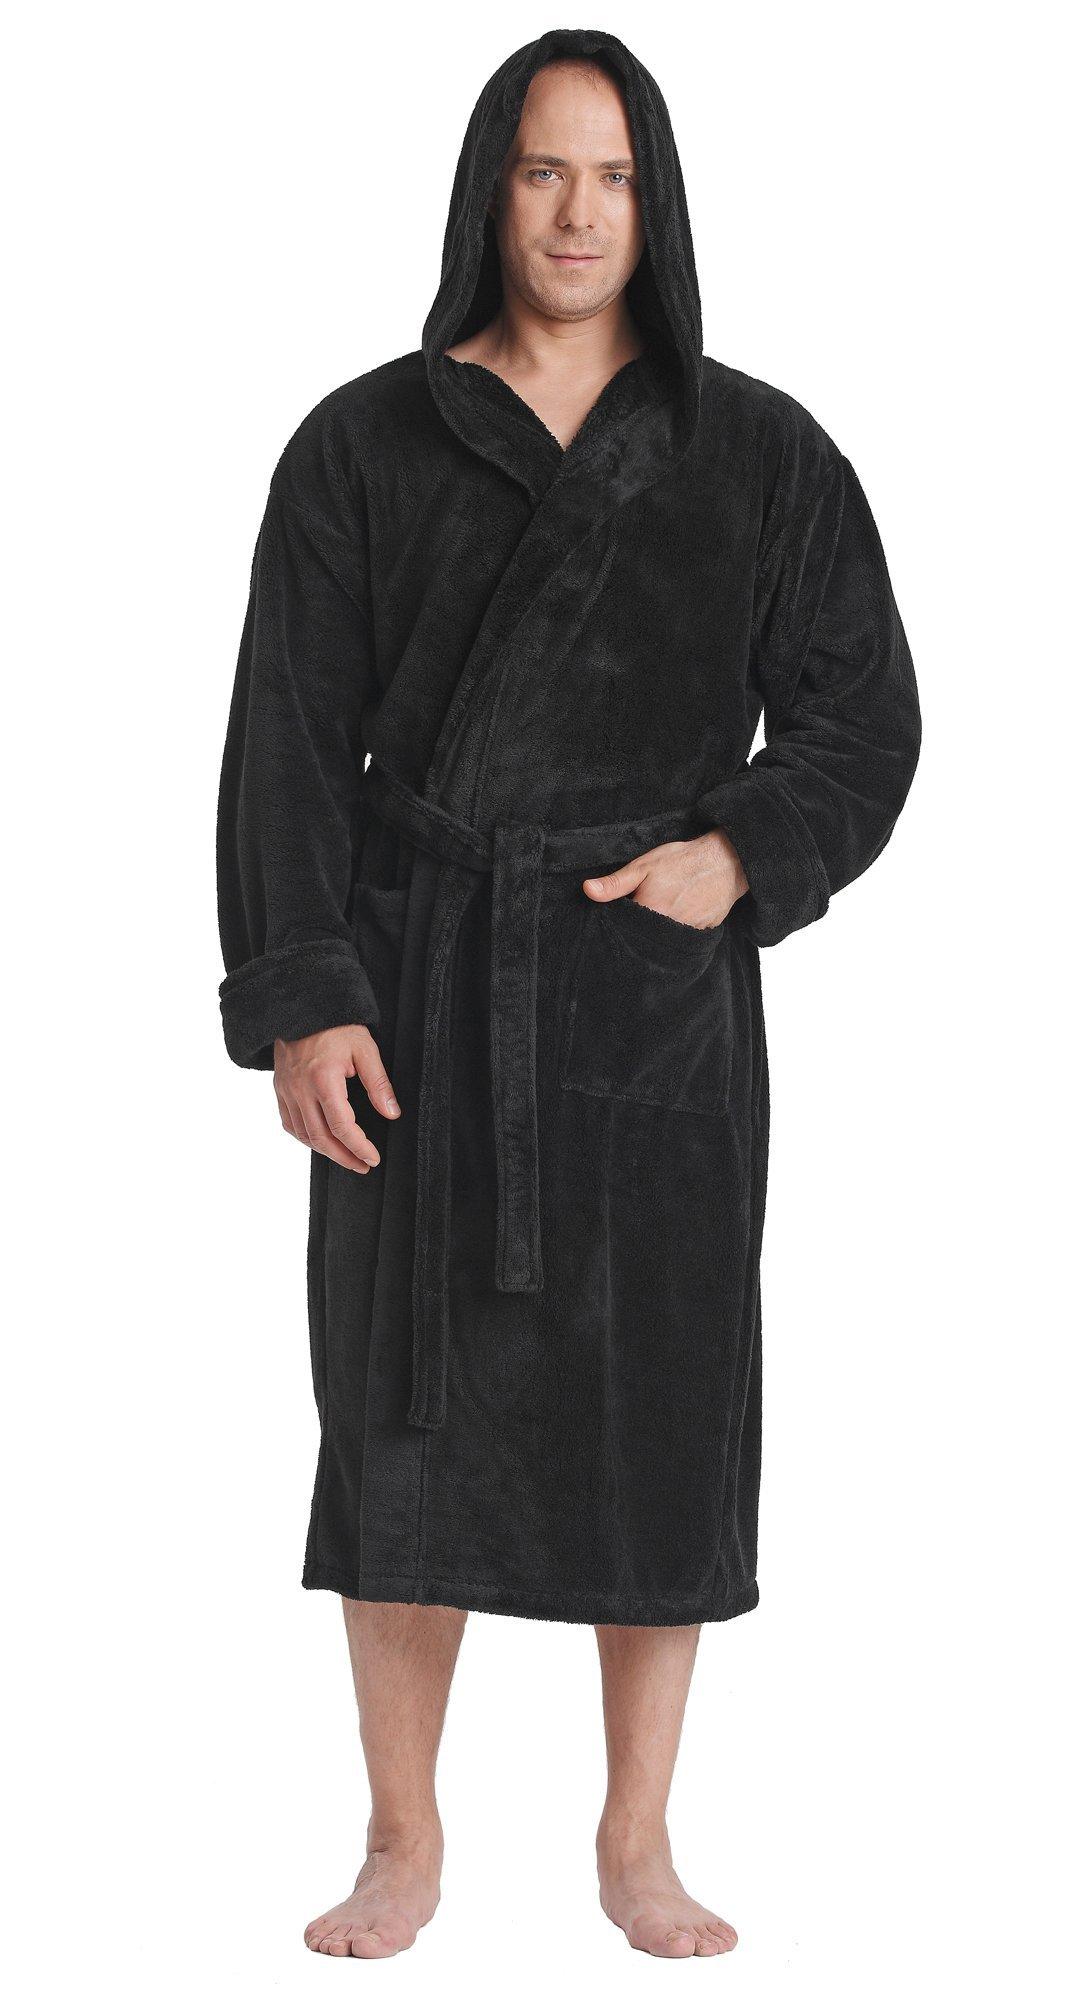 Arus Men's Hooded Satin Touch Fleece Bathrobe Turkish Soft Plush Robe Black XXL